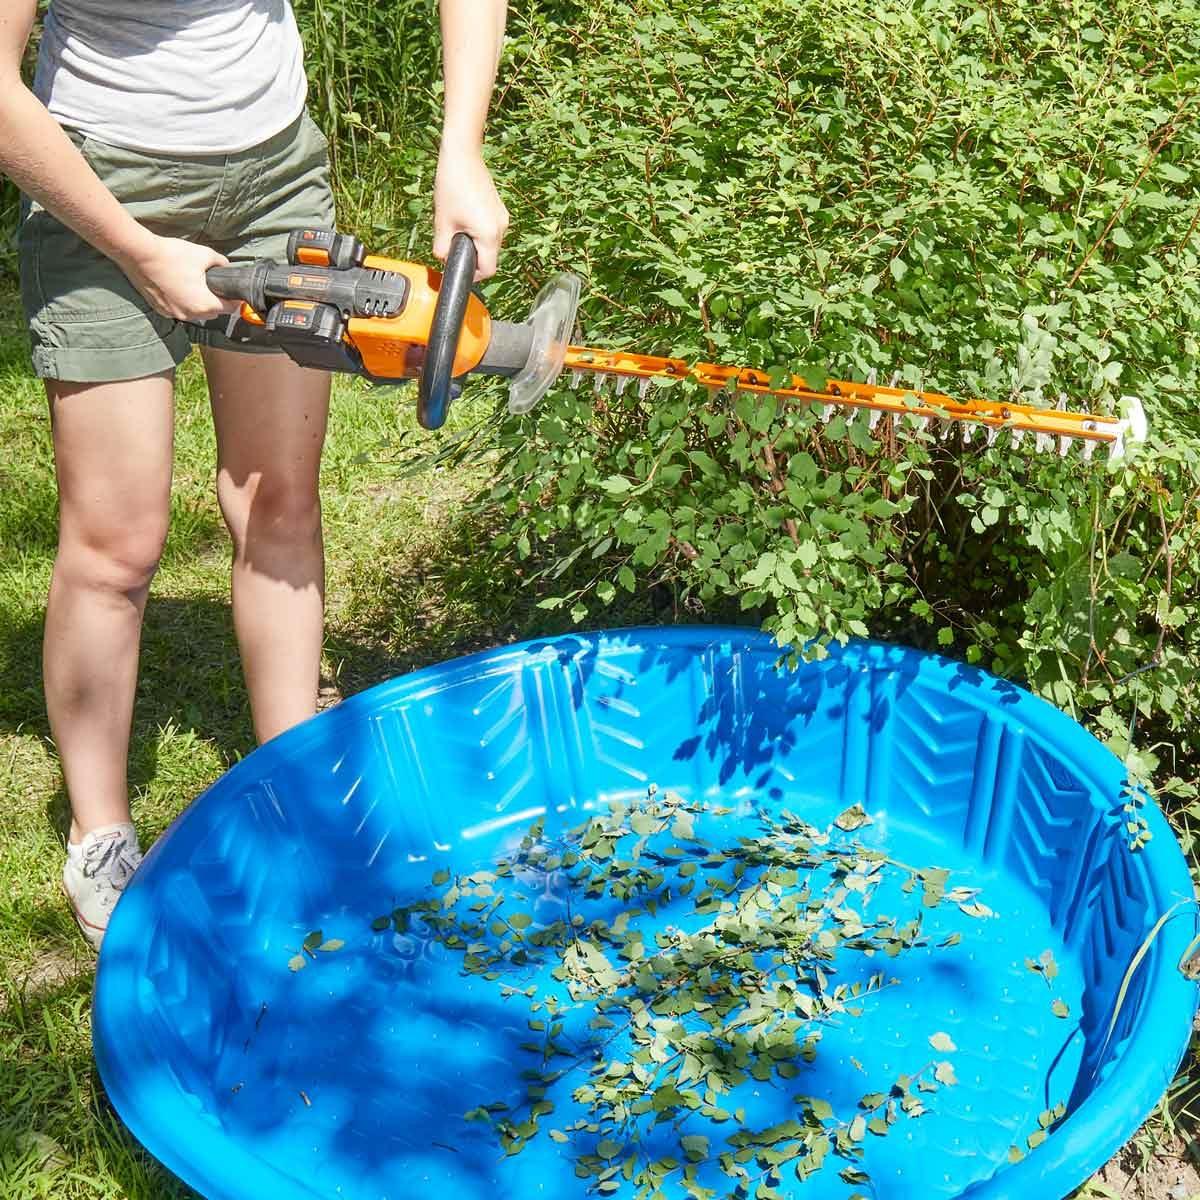 HH kiddie pool bush clippings